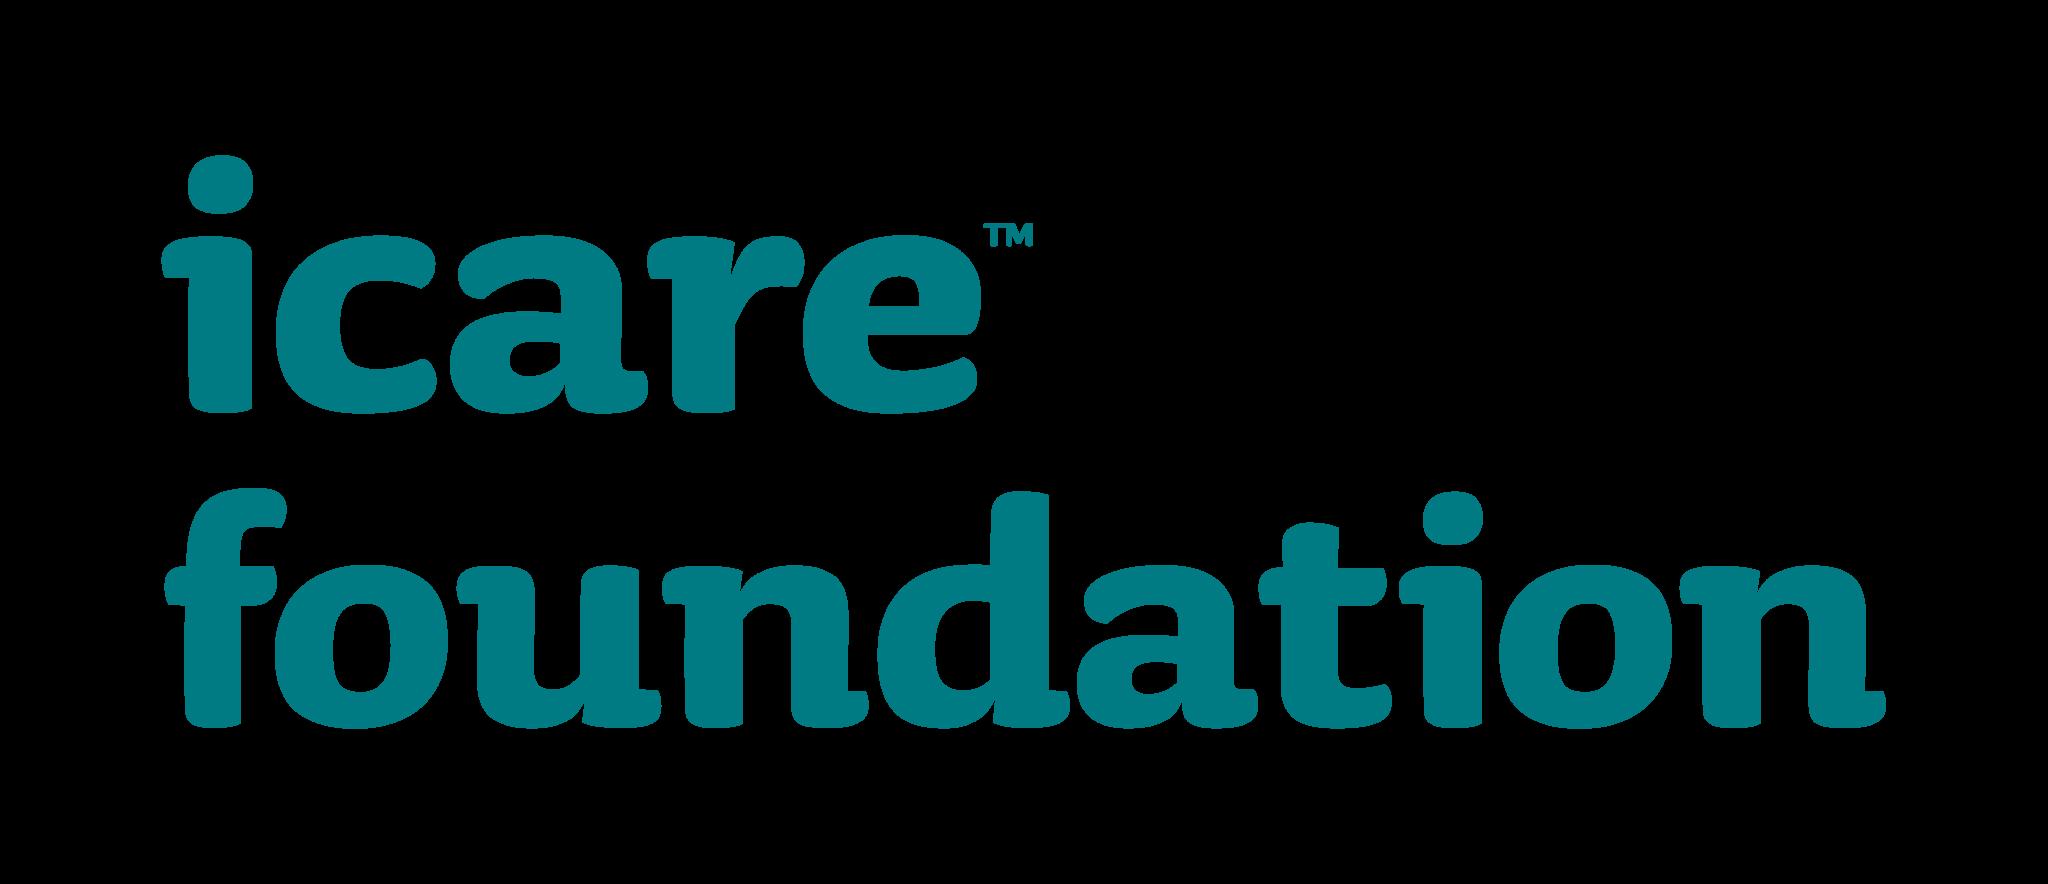 iCare foundation partner logo